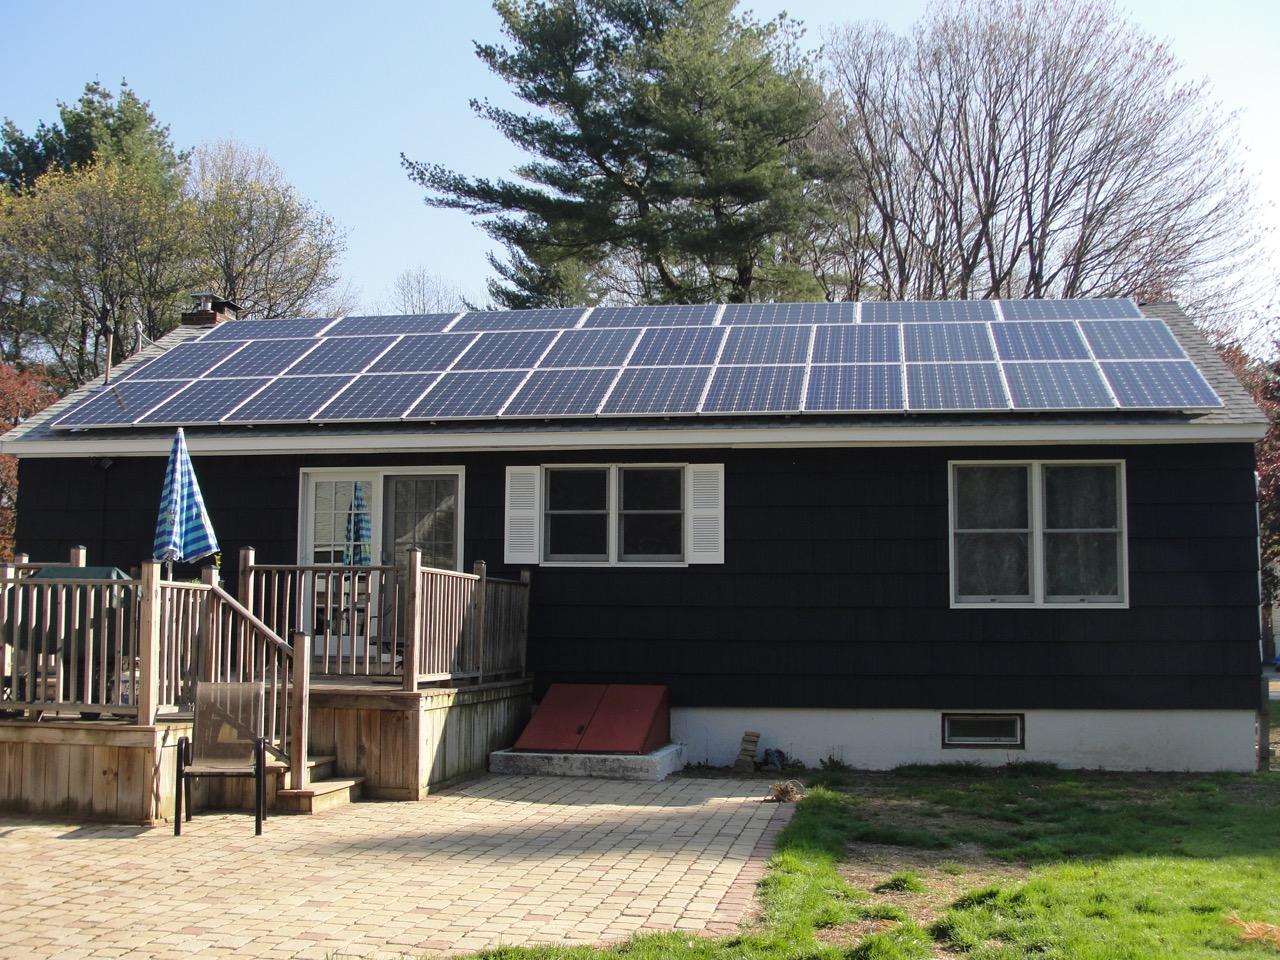 Solar Panels all up